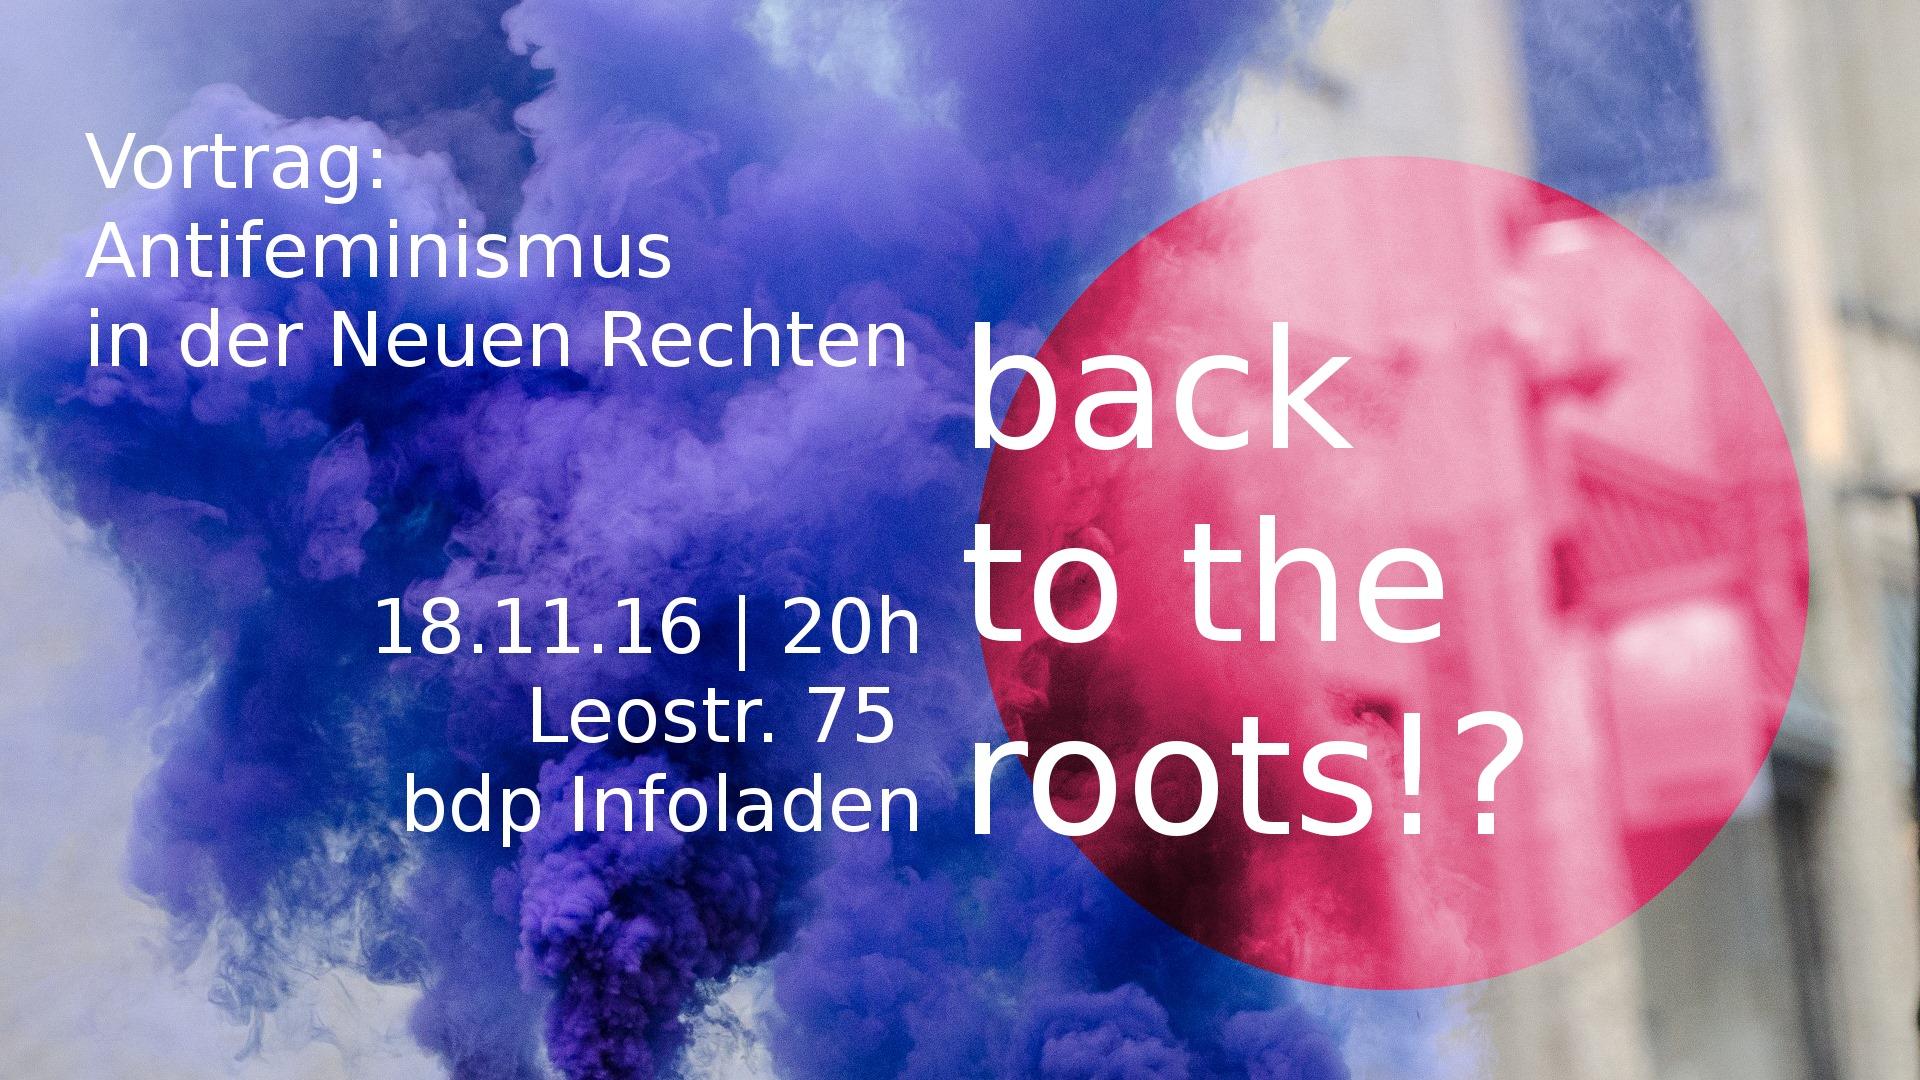 """Back to the roots?! – Antifeminismus in der Neuen Rechten"